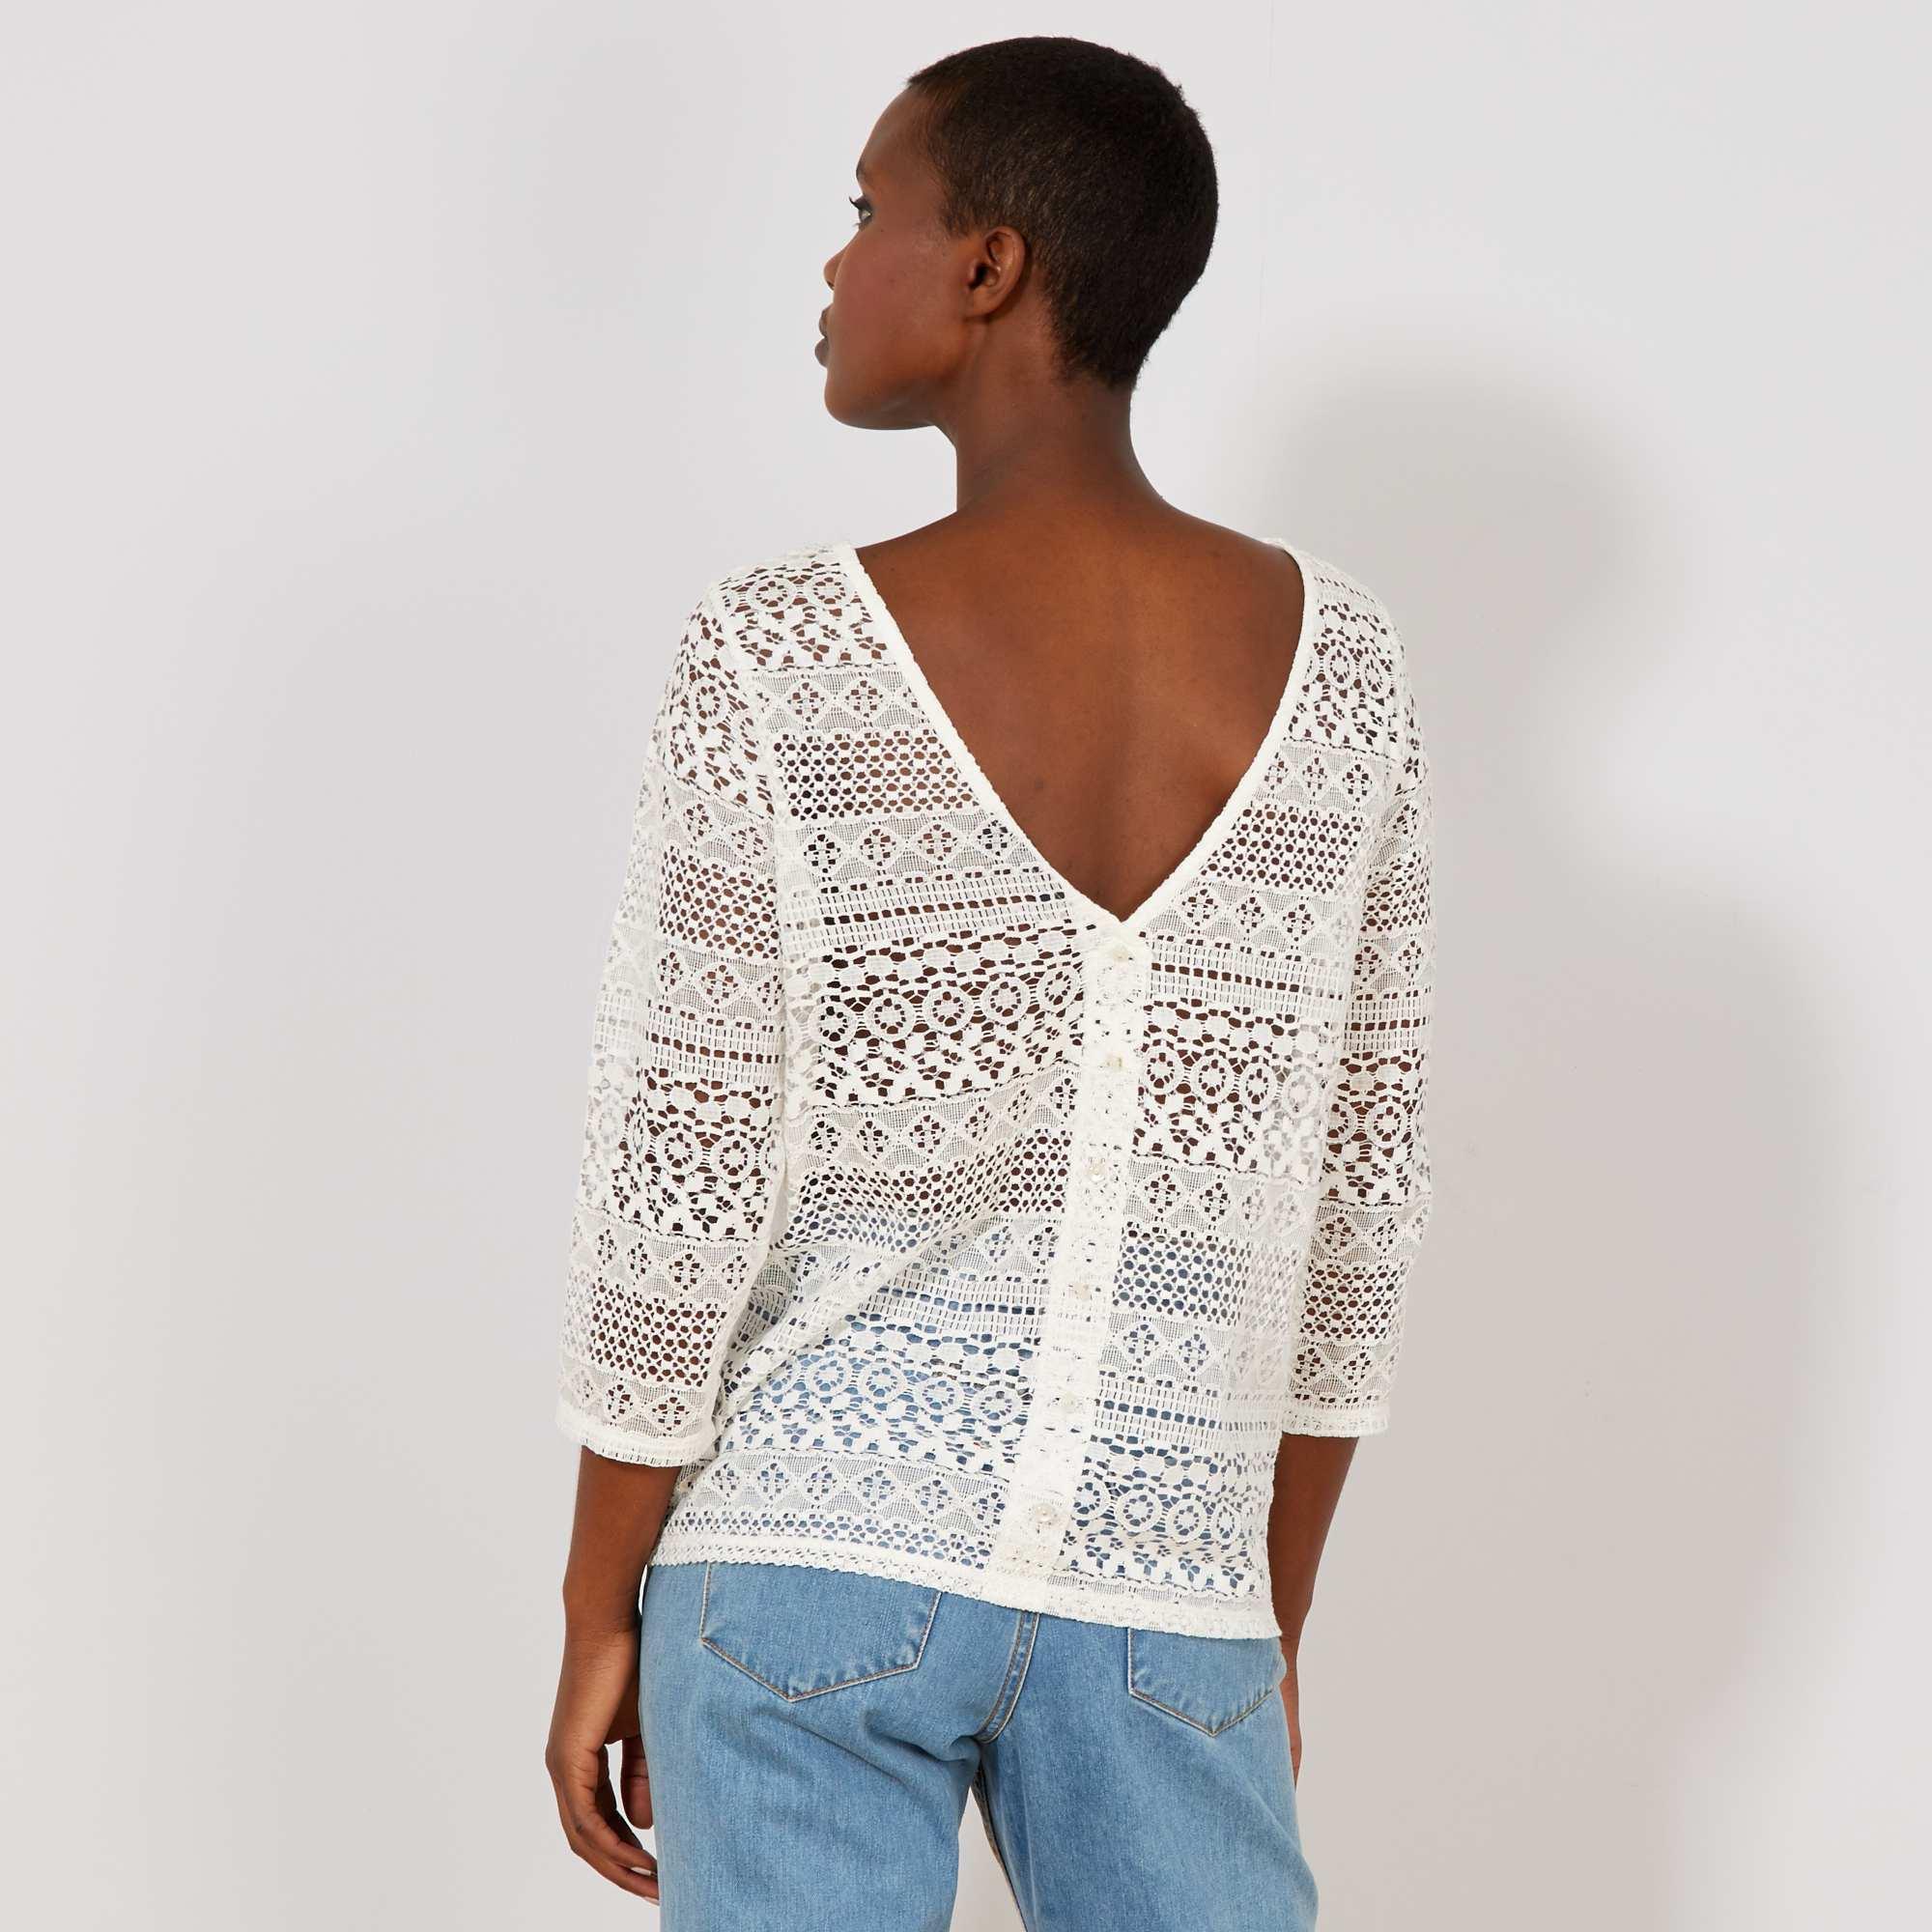 25150f04f4b T-shirt à dentelle Femme - blanc - Kiabi - 15